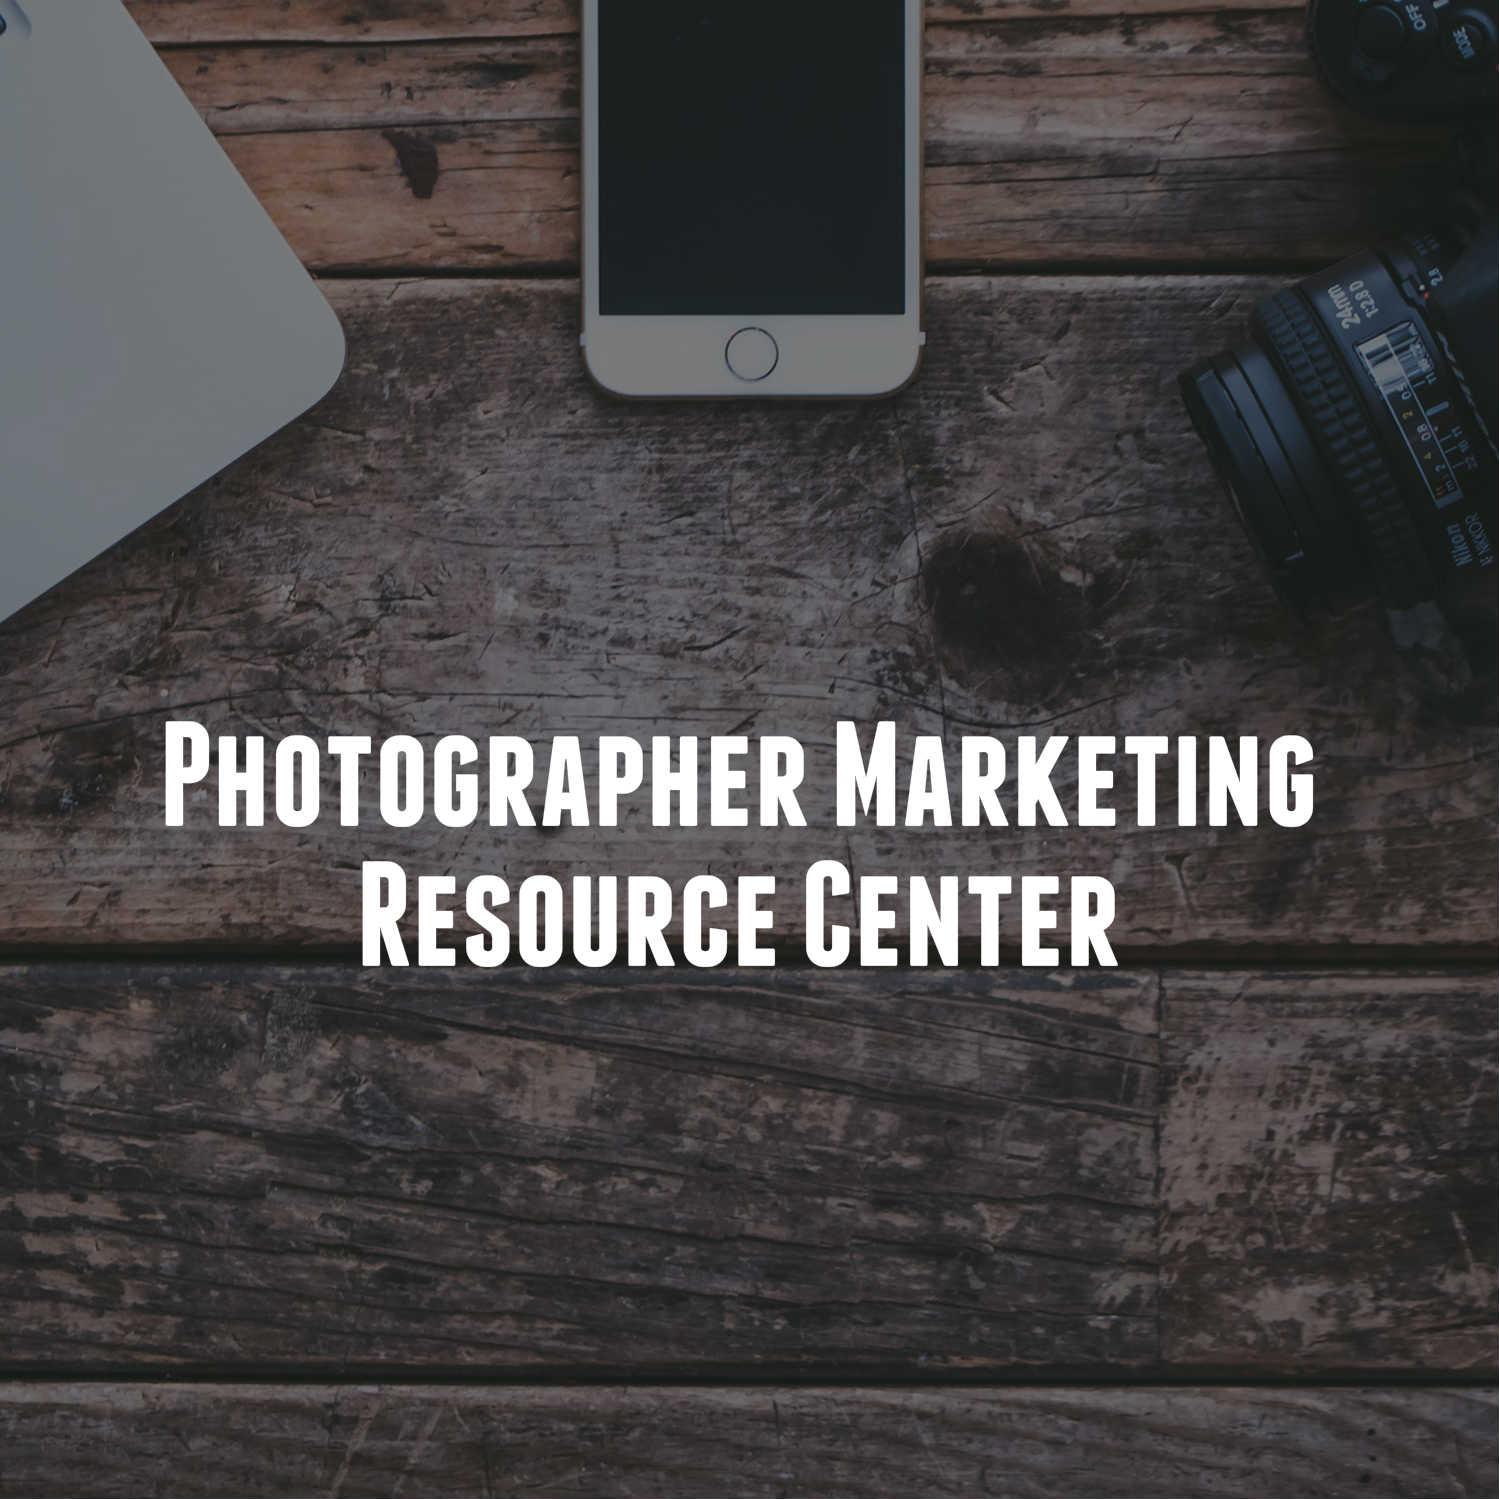 Photographer Marketing Resource Center